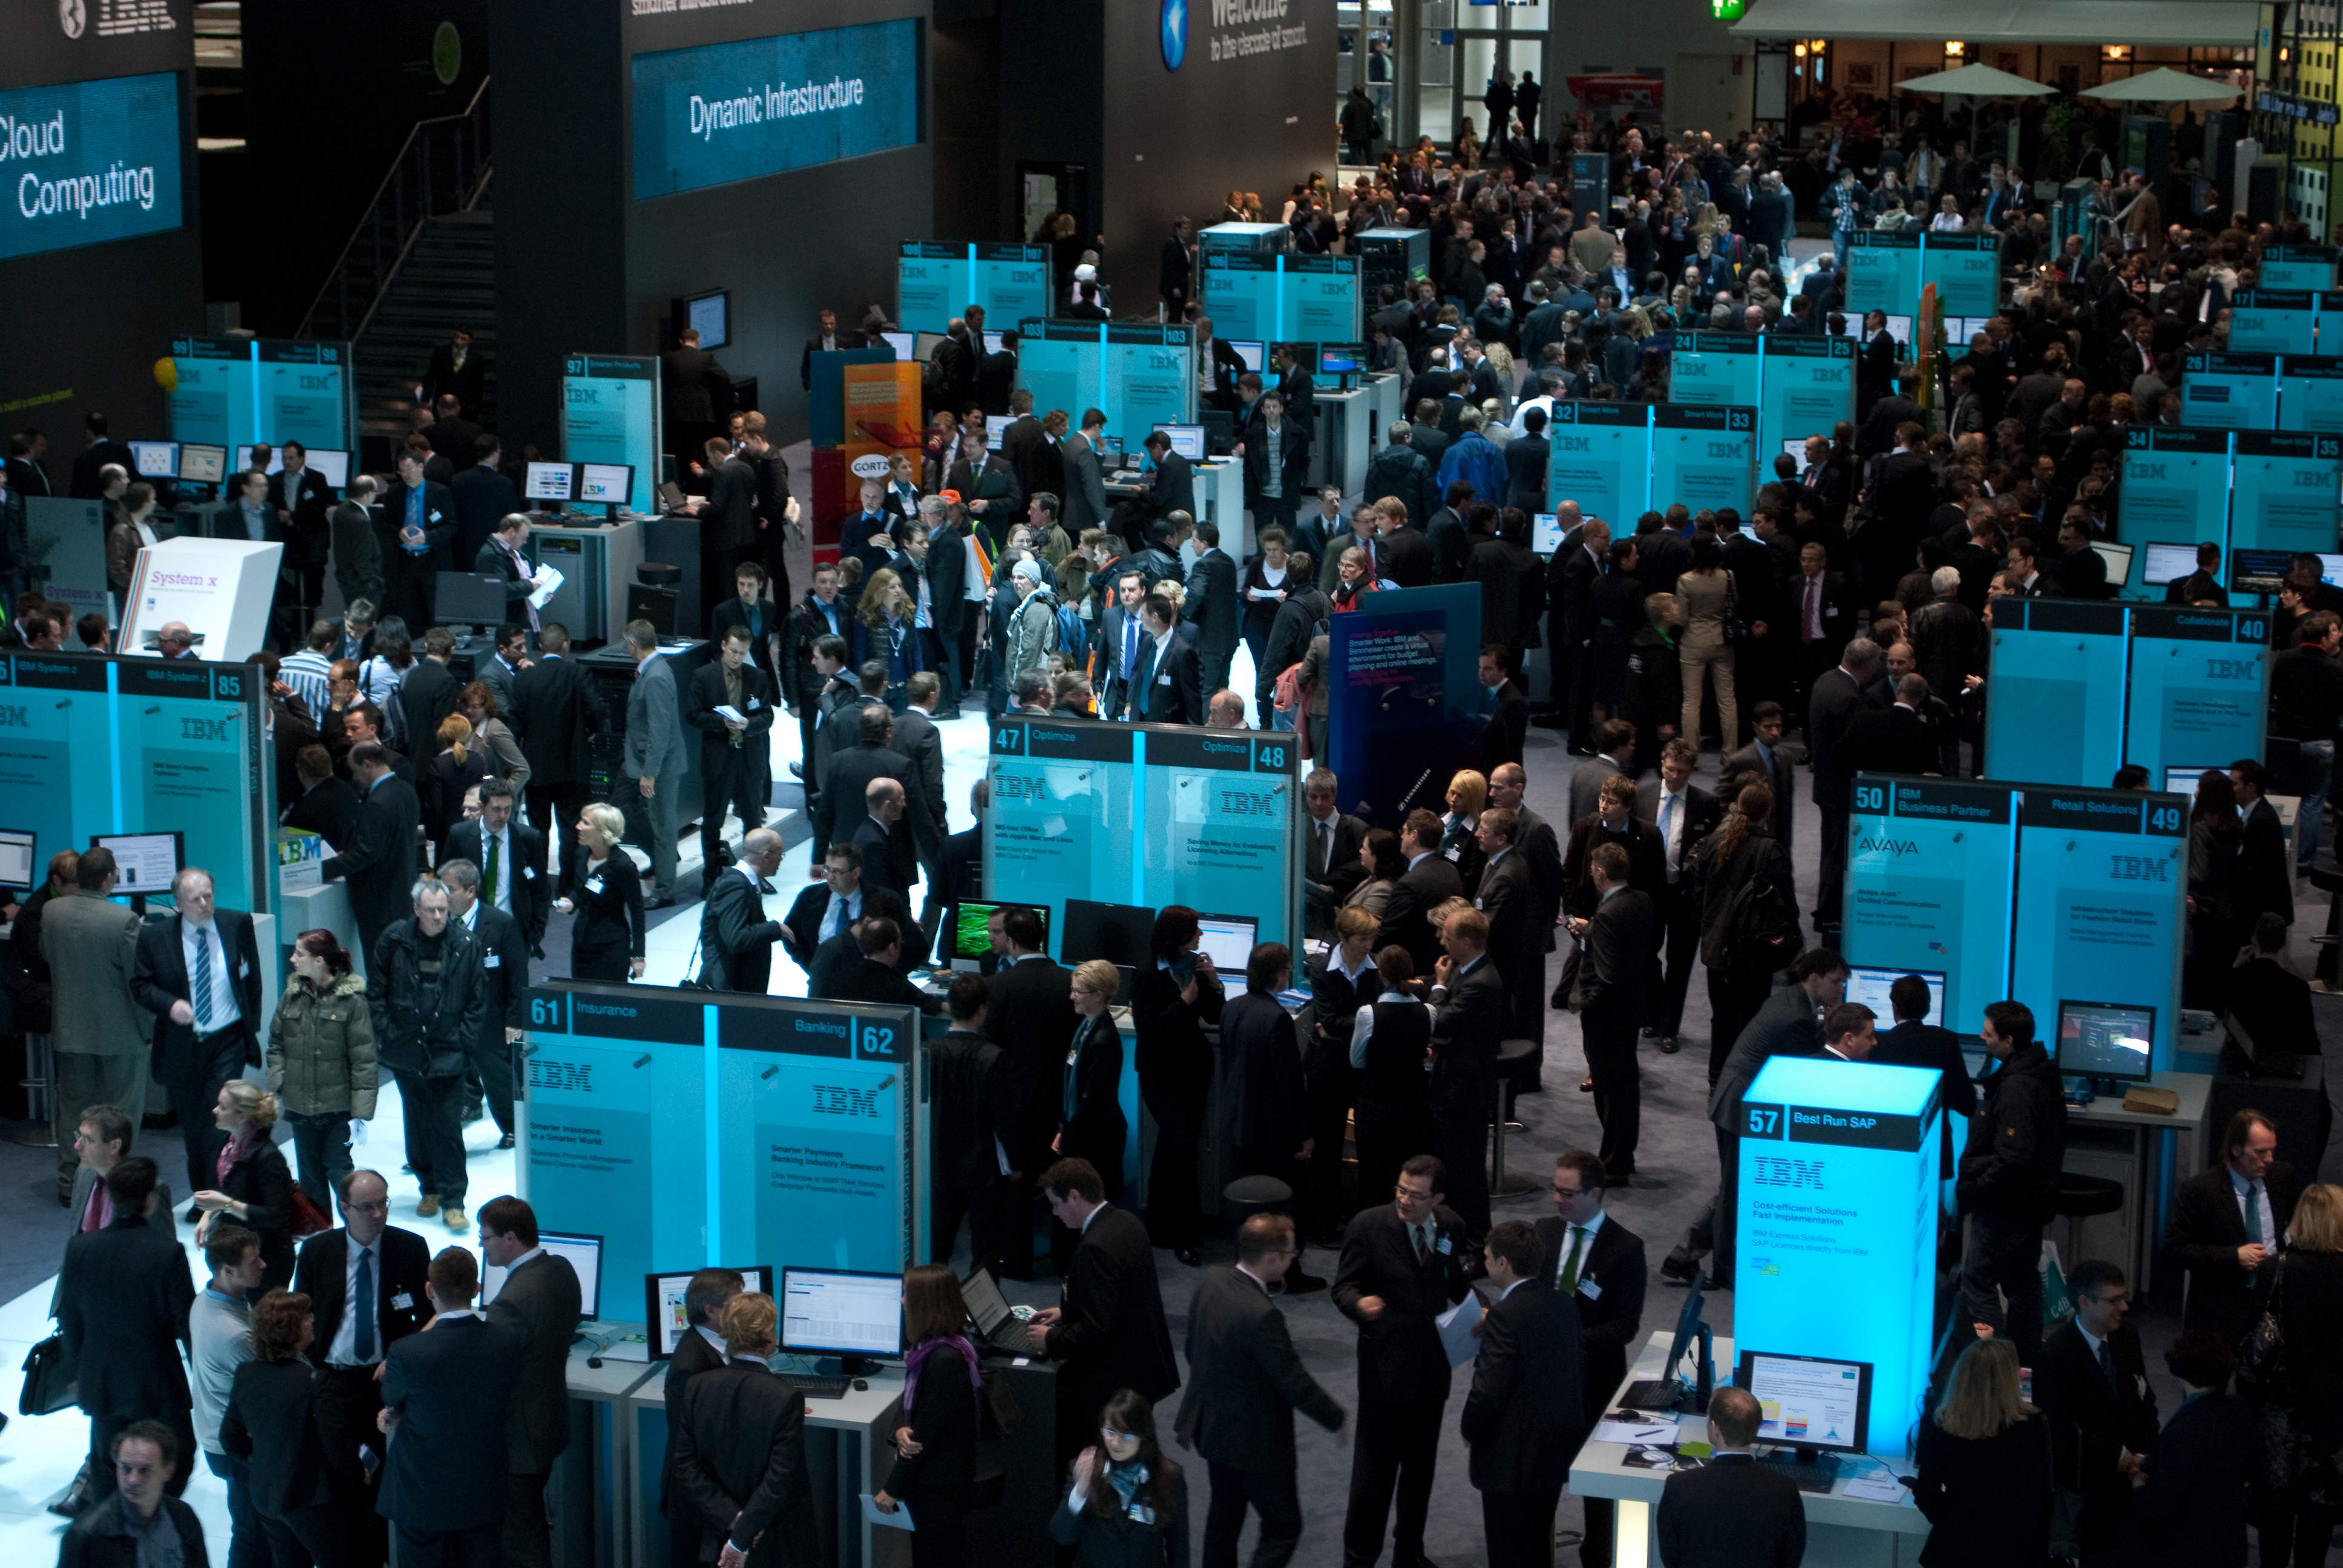 Business exhibitions - IBM CeBIT 2010